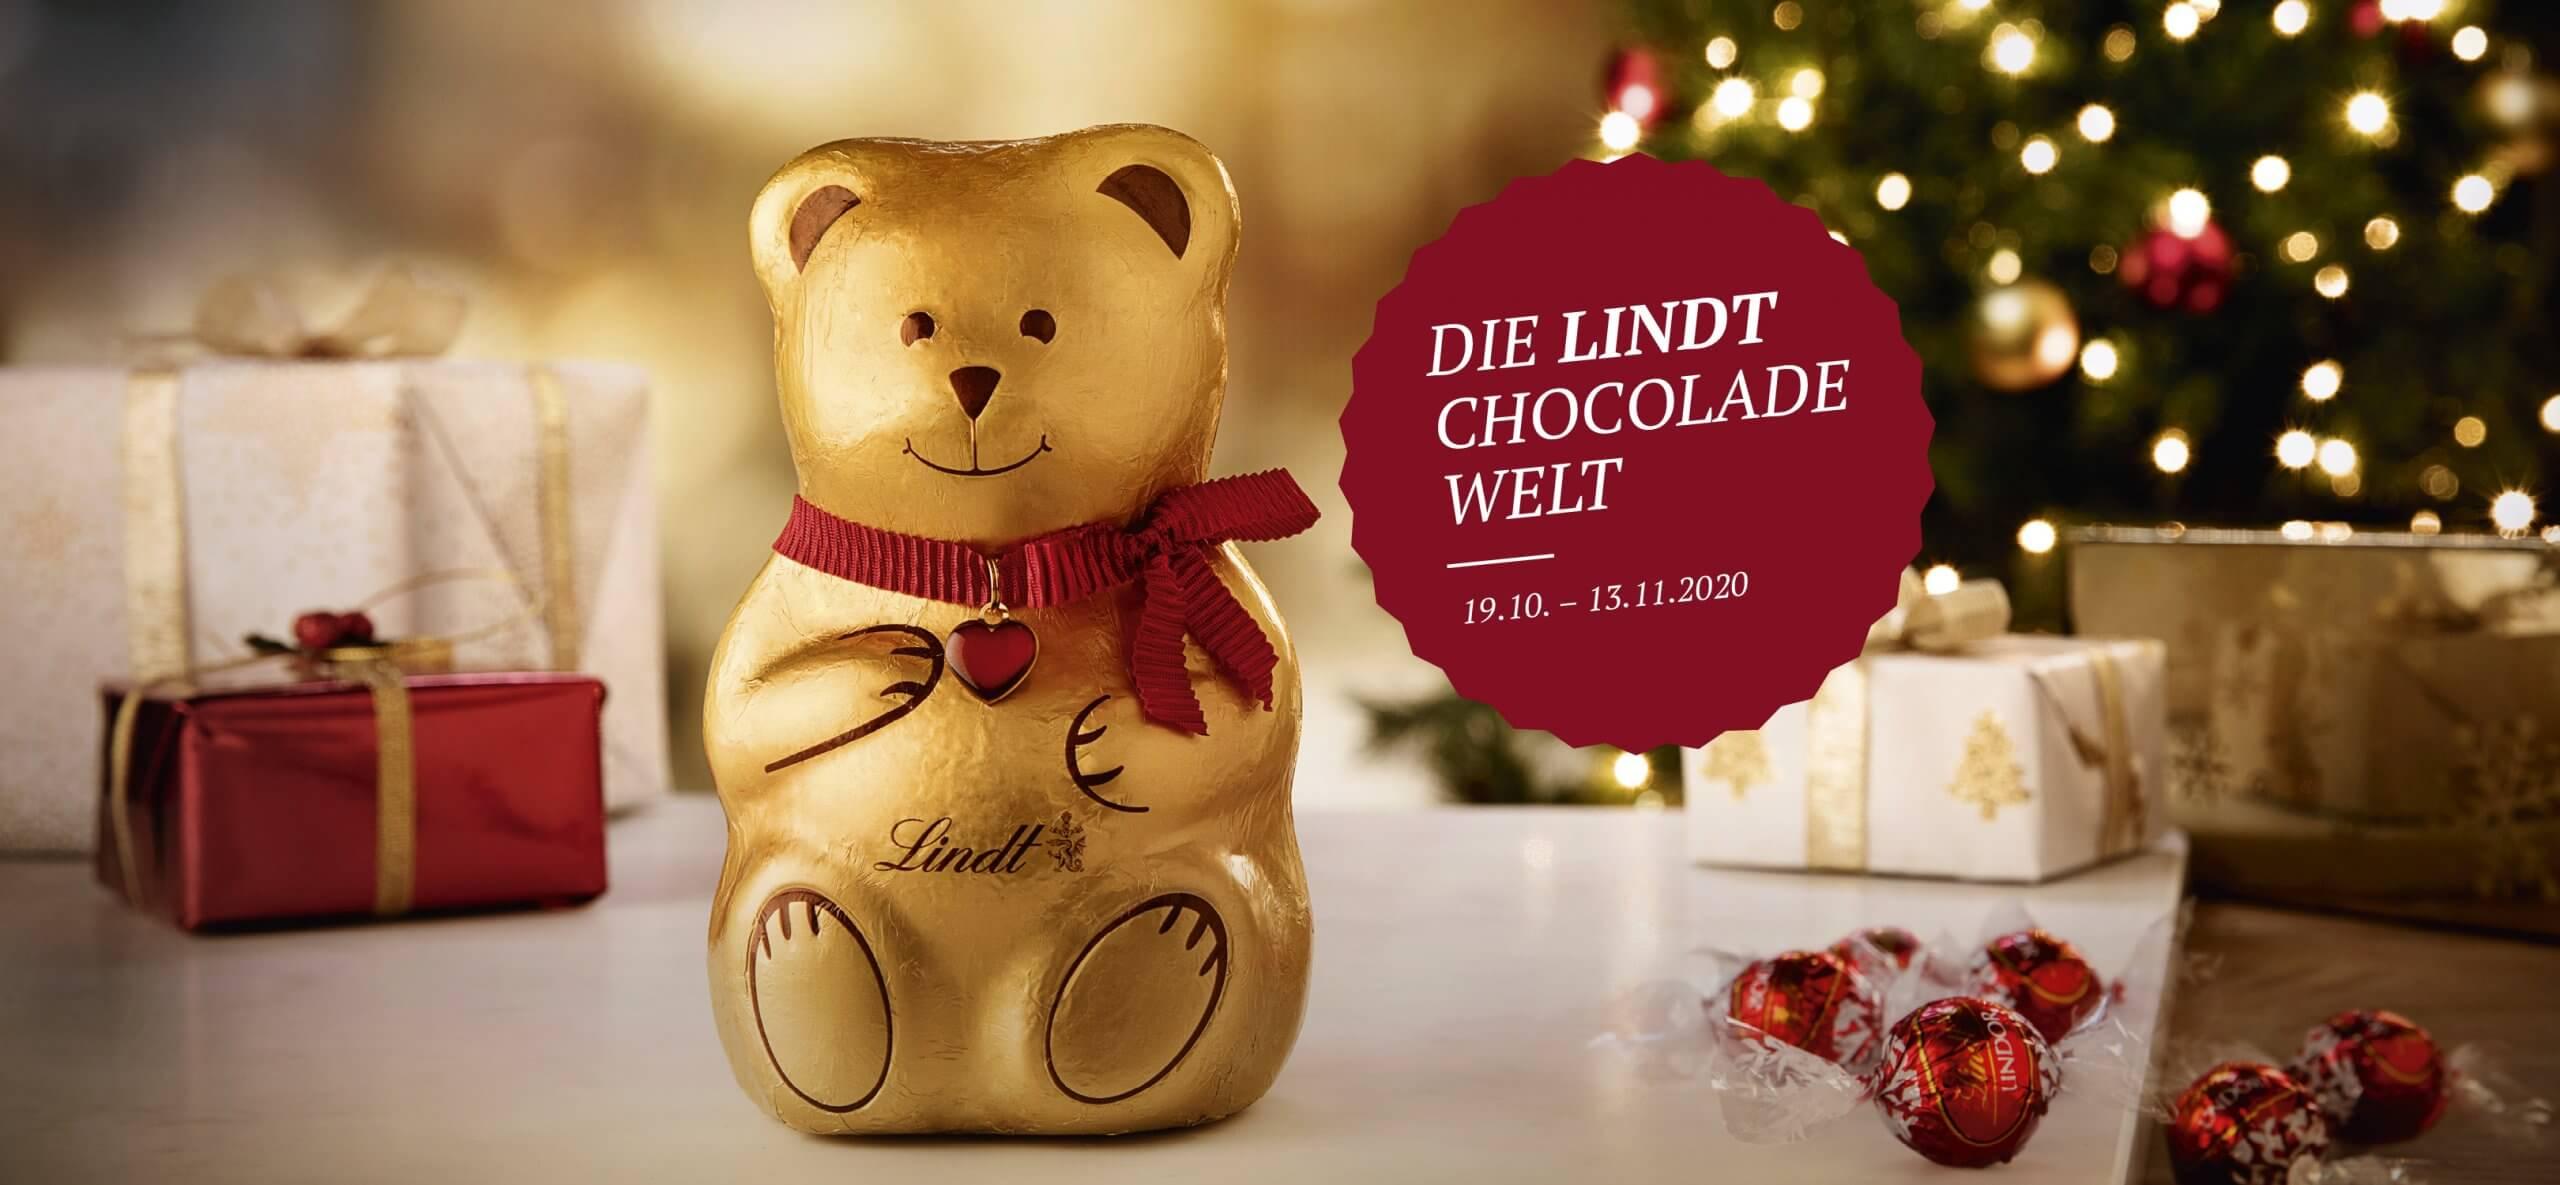 Die Lindt Chocolade Welt